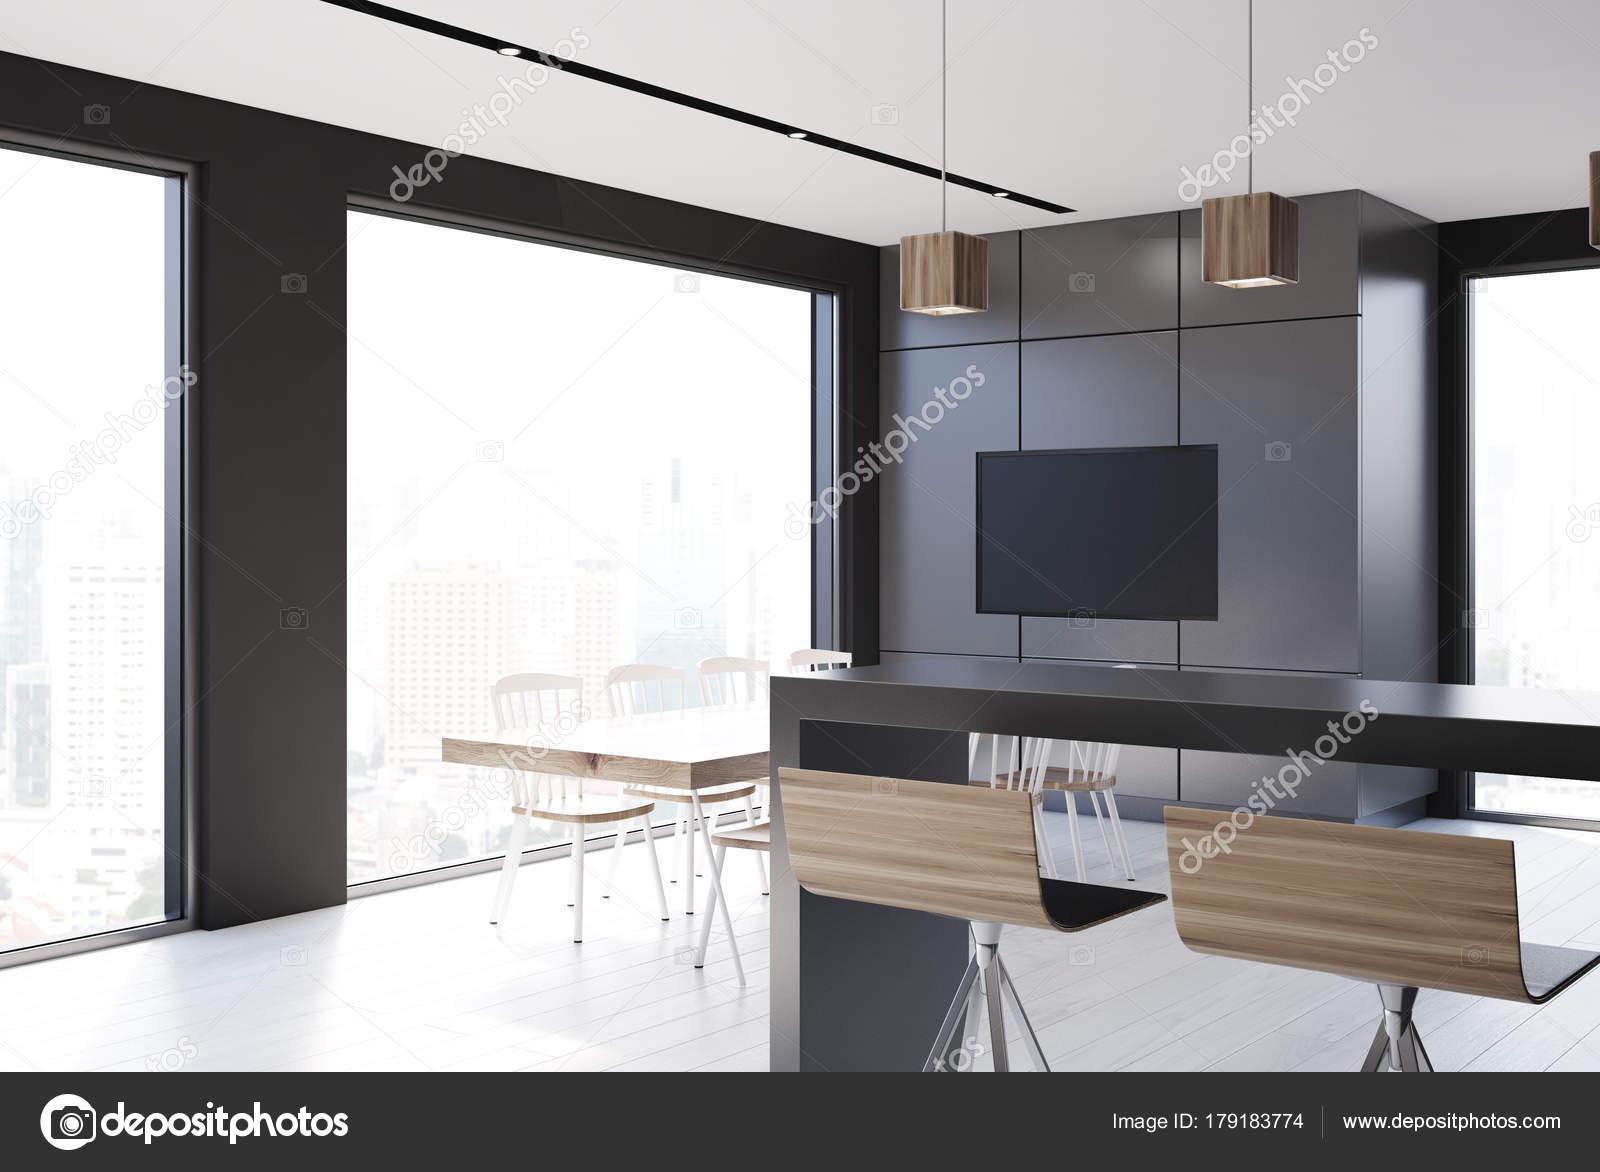 Piastrelle in grigio e nero cucina tv u foto stock